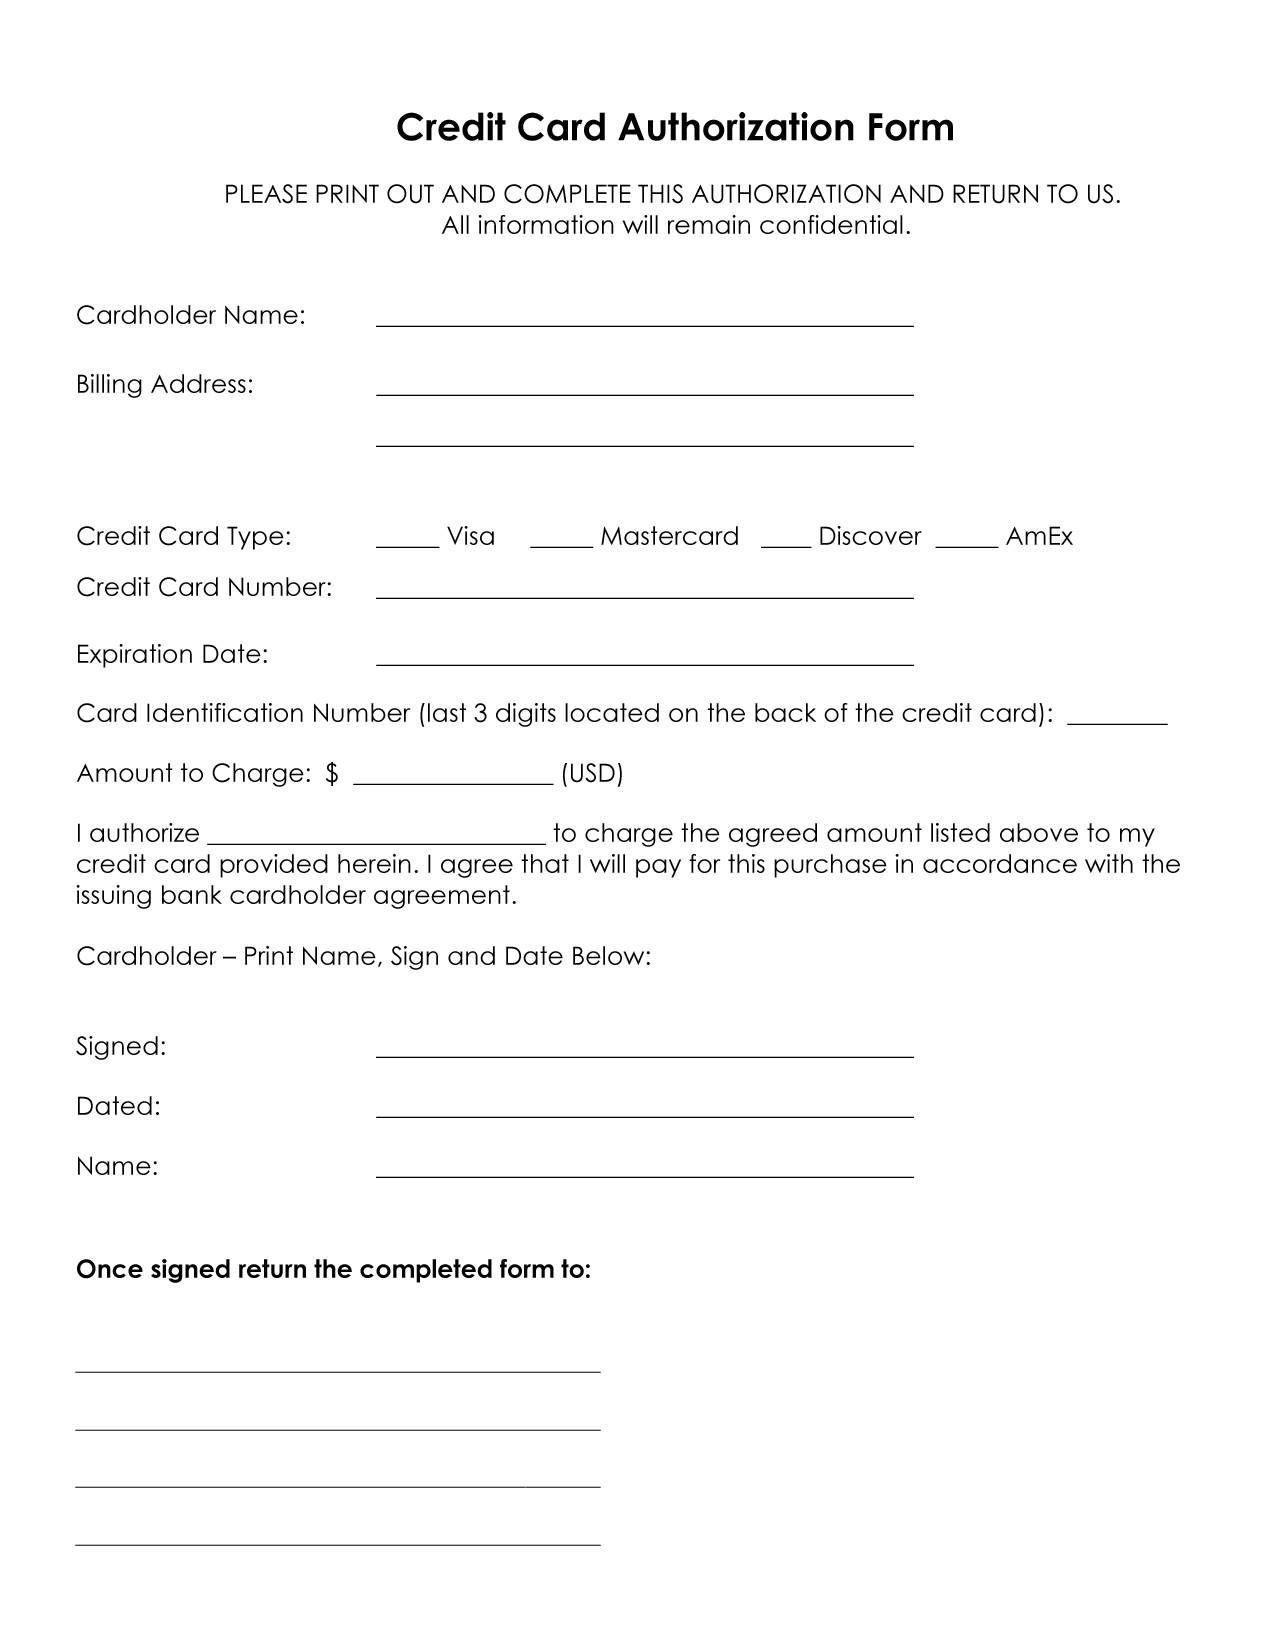 001 Shocking Credit Card Form Template Image  Html Example Codepen Authorization FreeFull